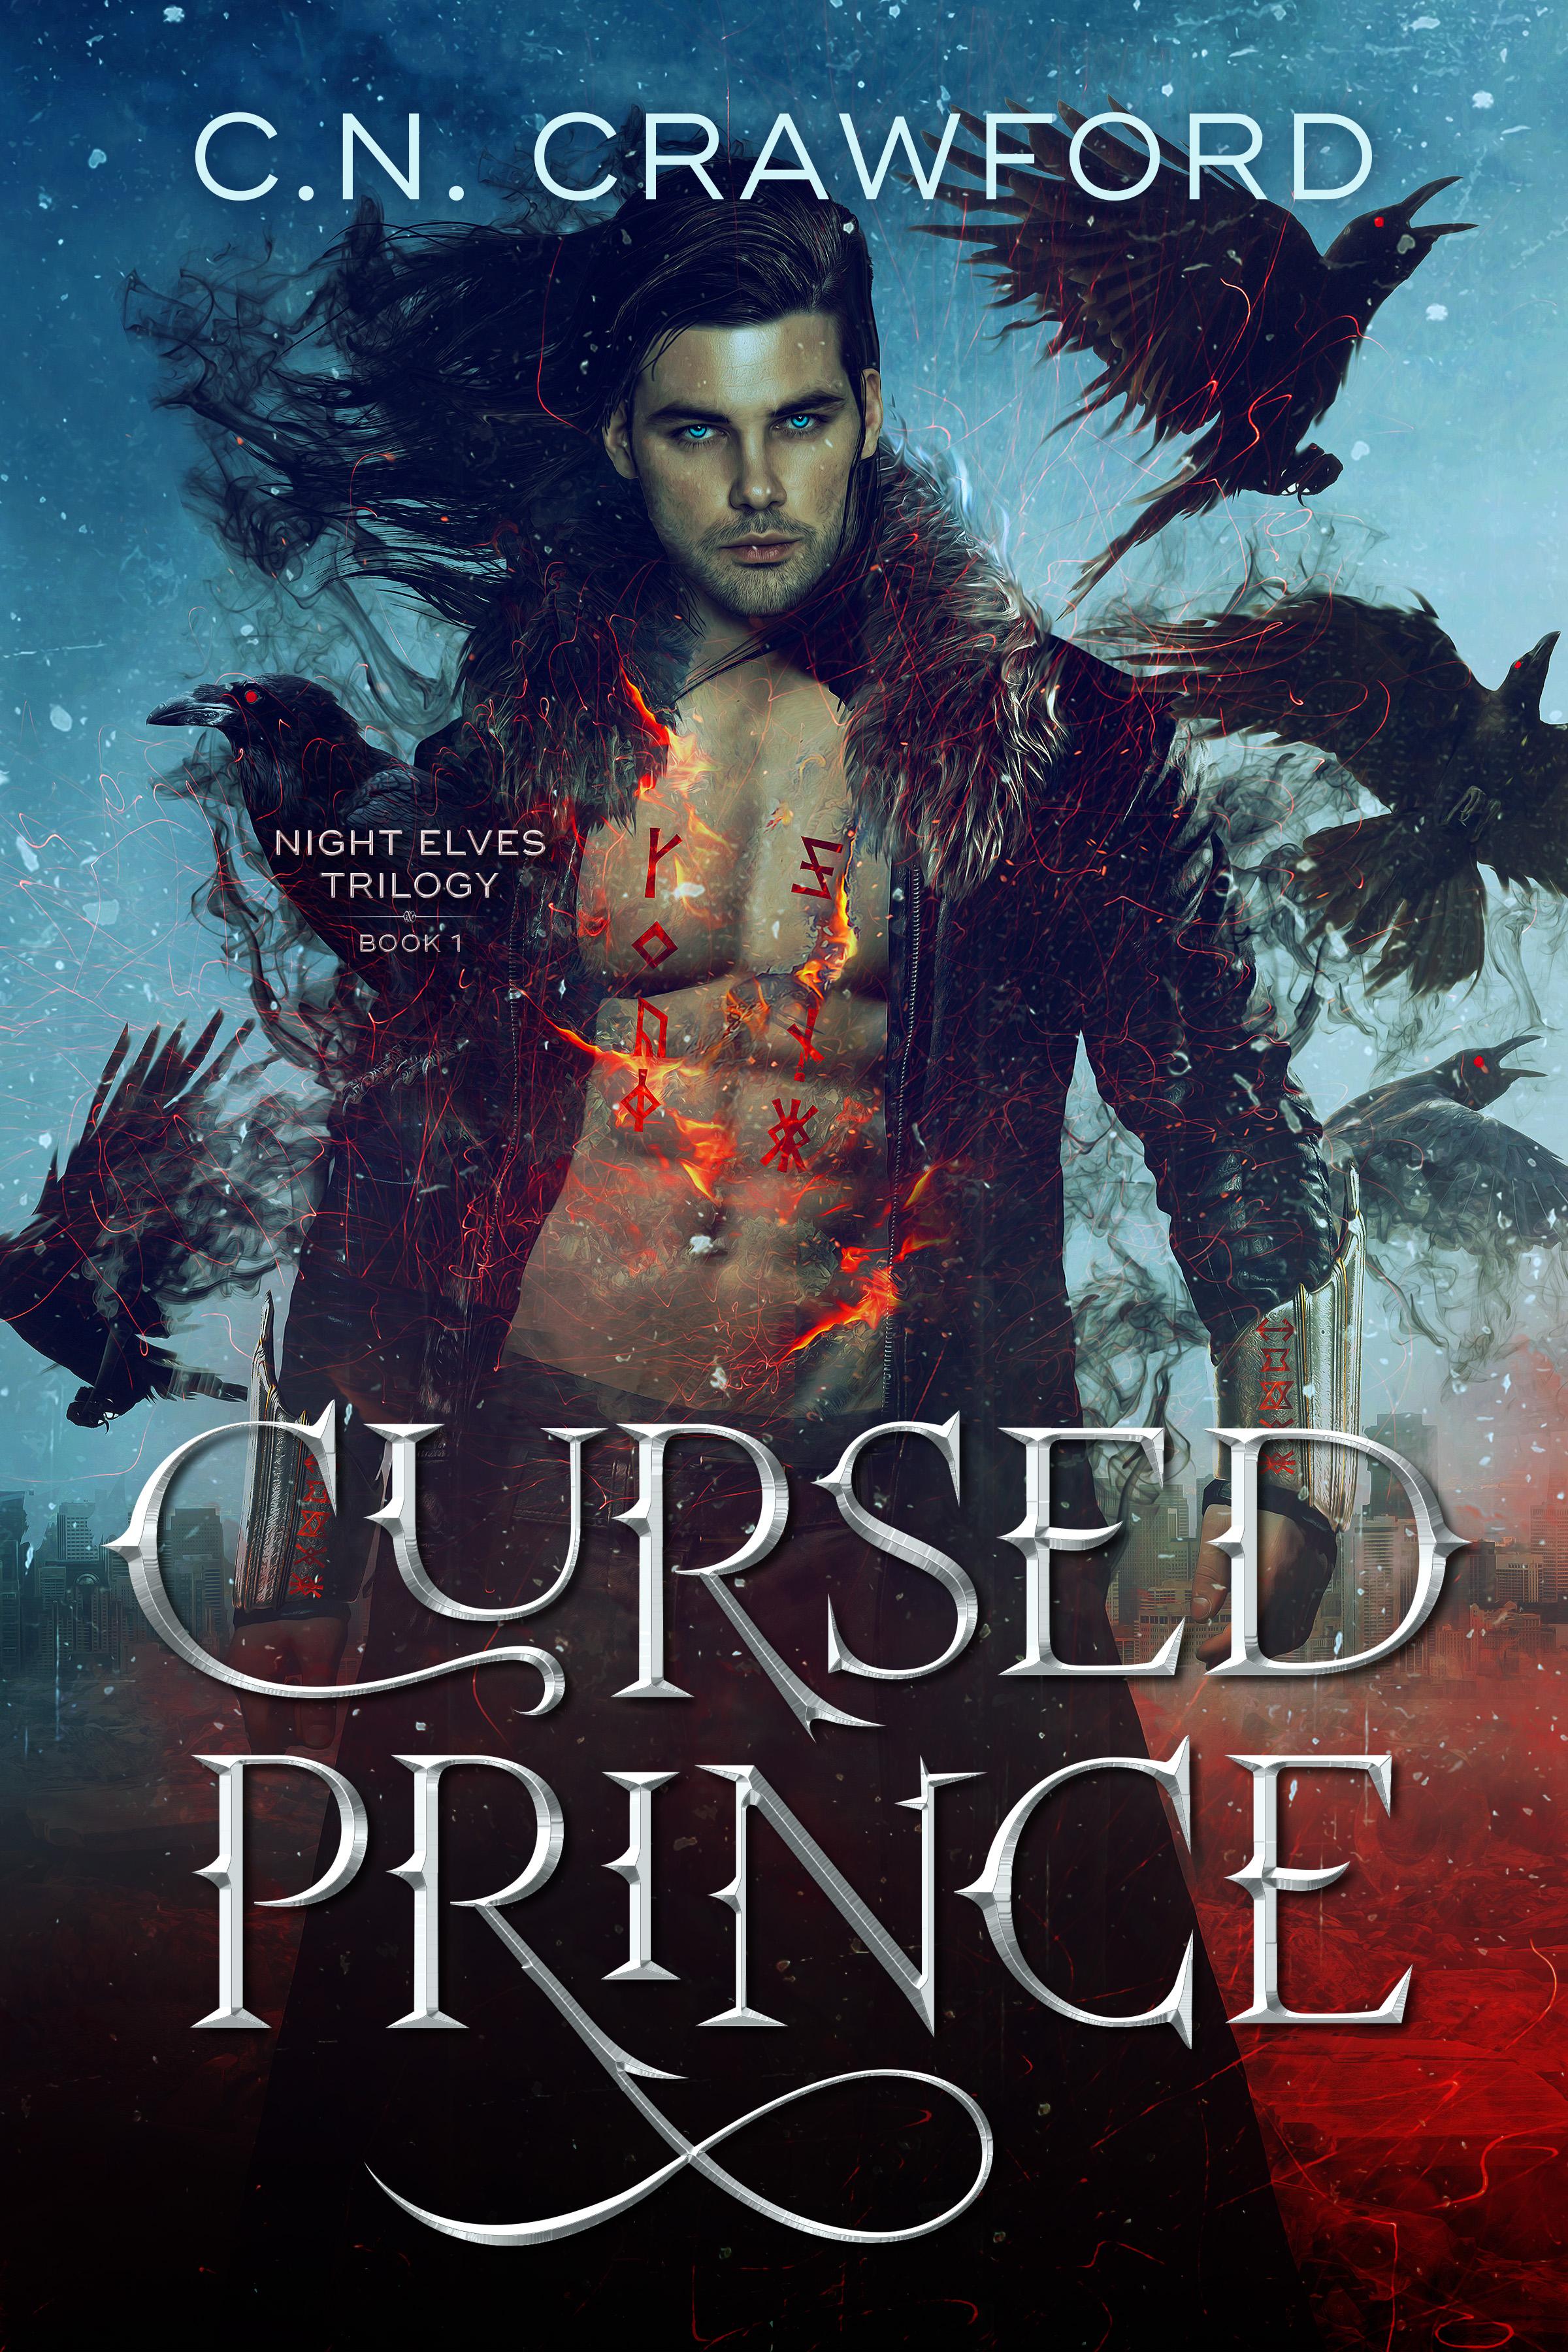 Cursed Prince (Night Elves Trilogy #1)